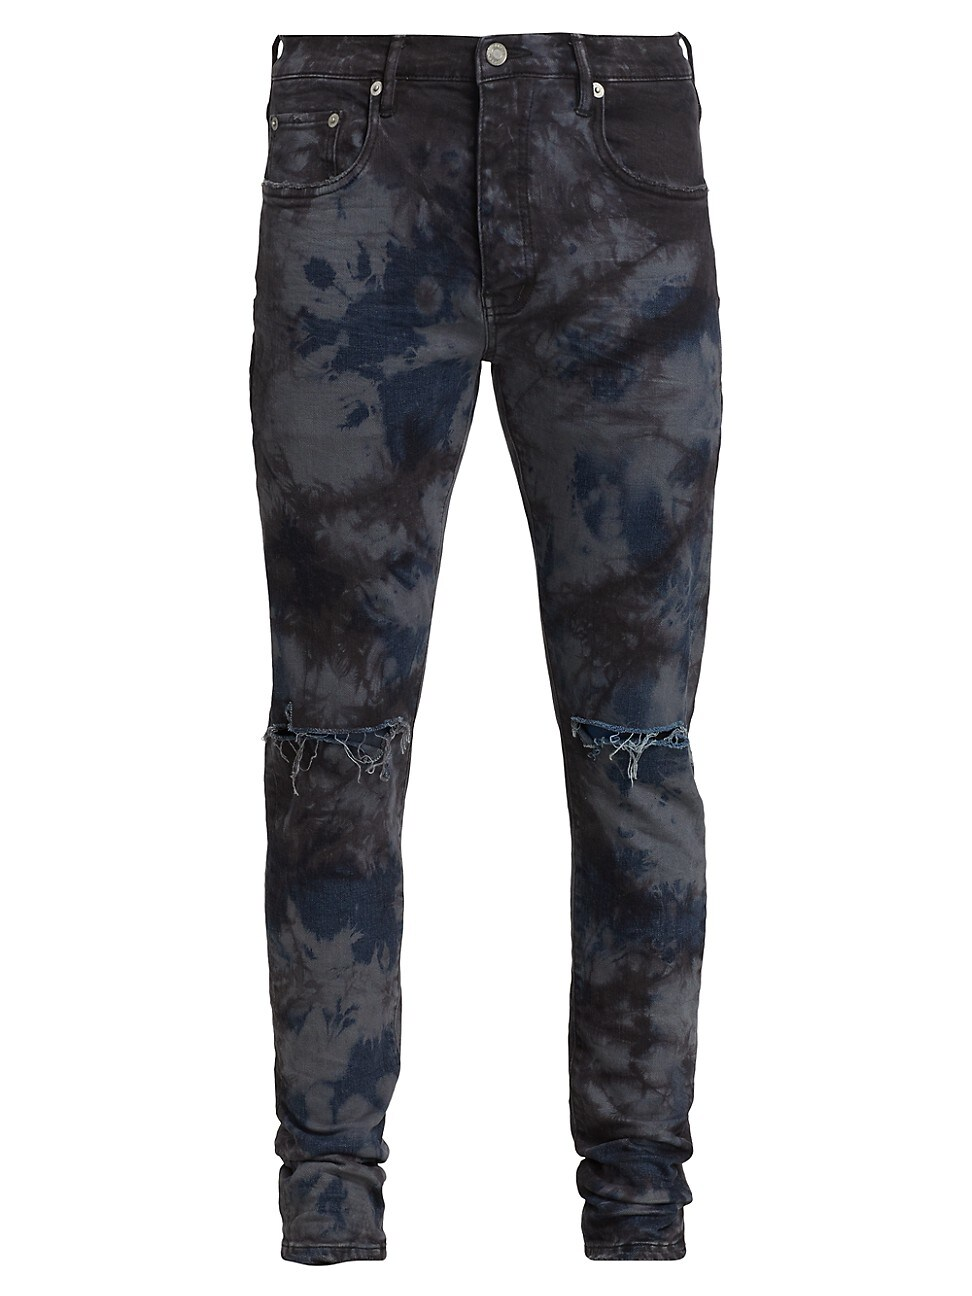 Purple Brand Jeans MEN'S P001 MARBLED DISTRESSED SKINNY JEANS